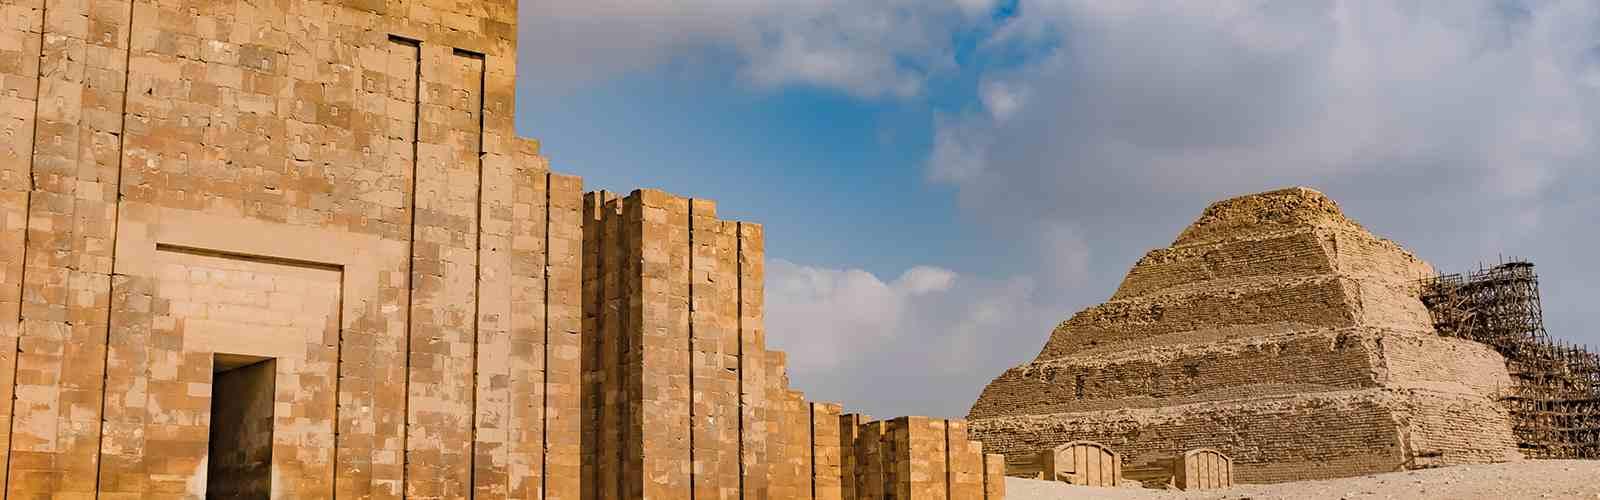 Sakkara Pyramid in Egypt